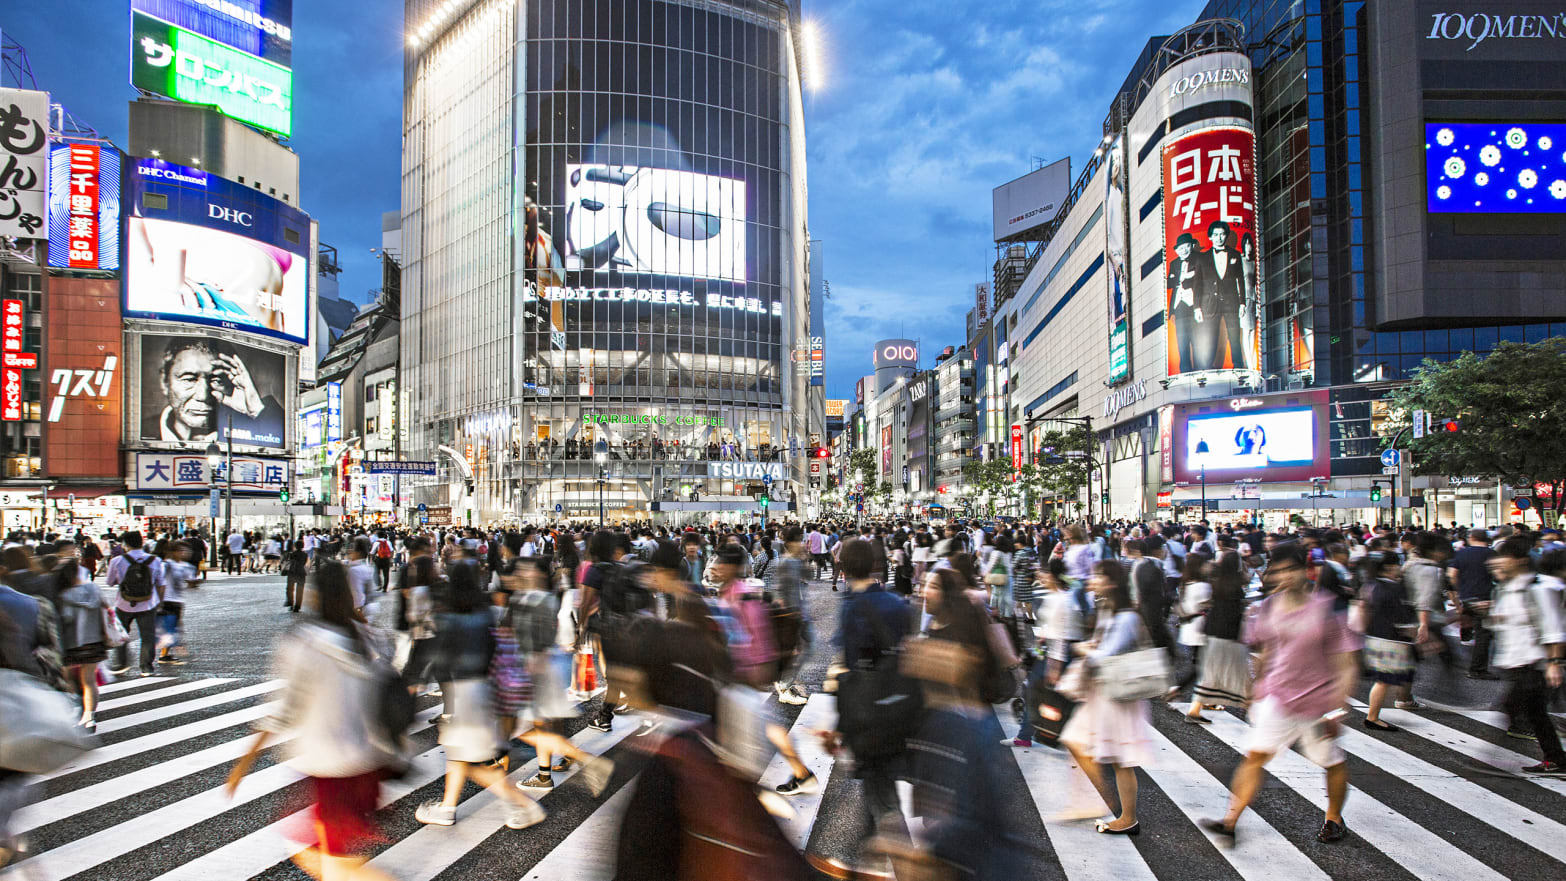 Does Japan Ever Convict Men for Rape?